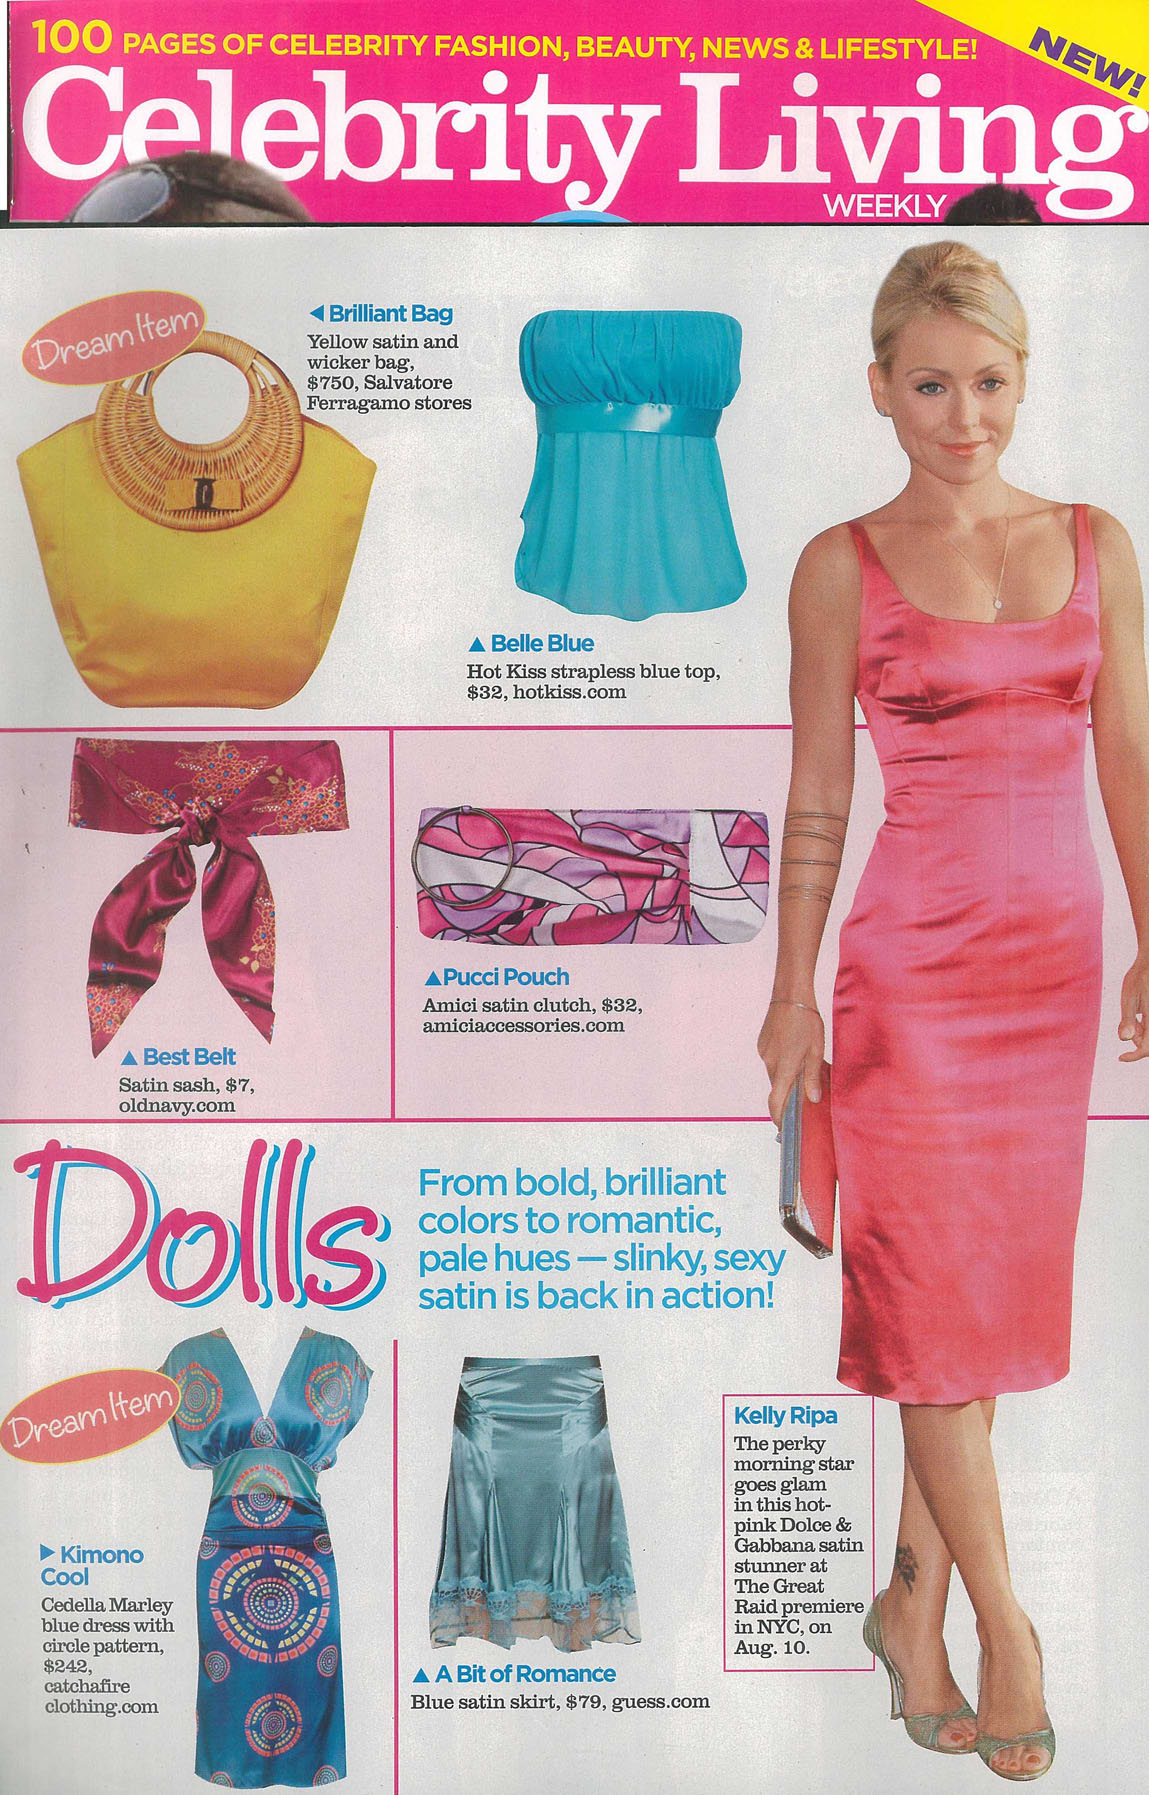 Celebrity Living Magazine. Catch A Fire Clothing. Blue Ocean Dress.